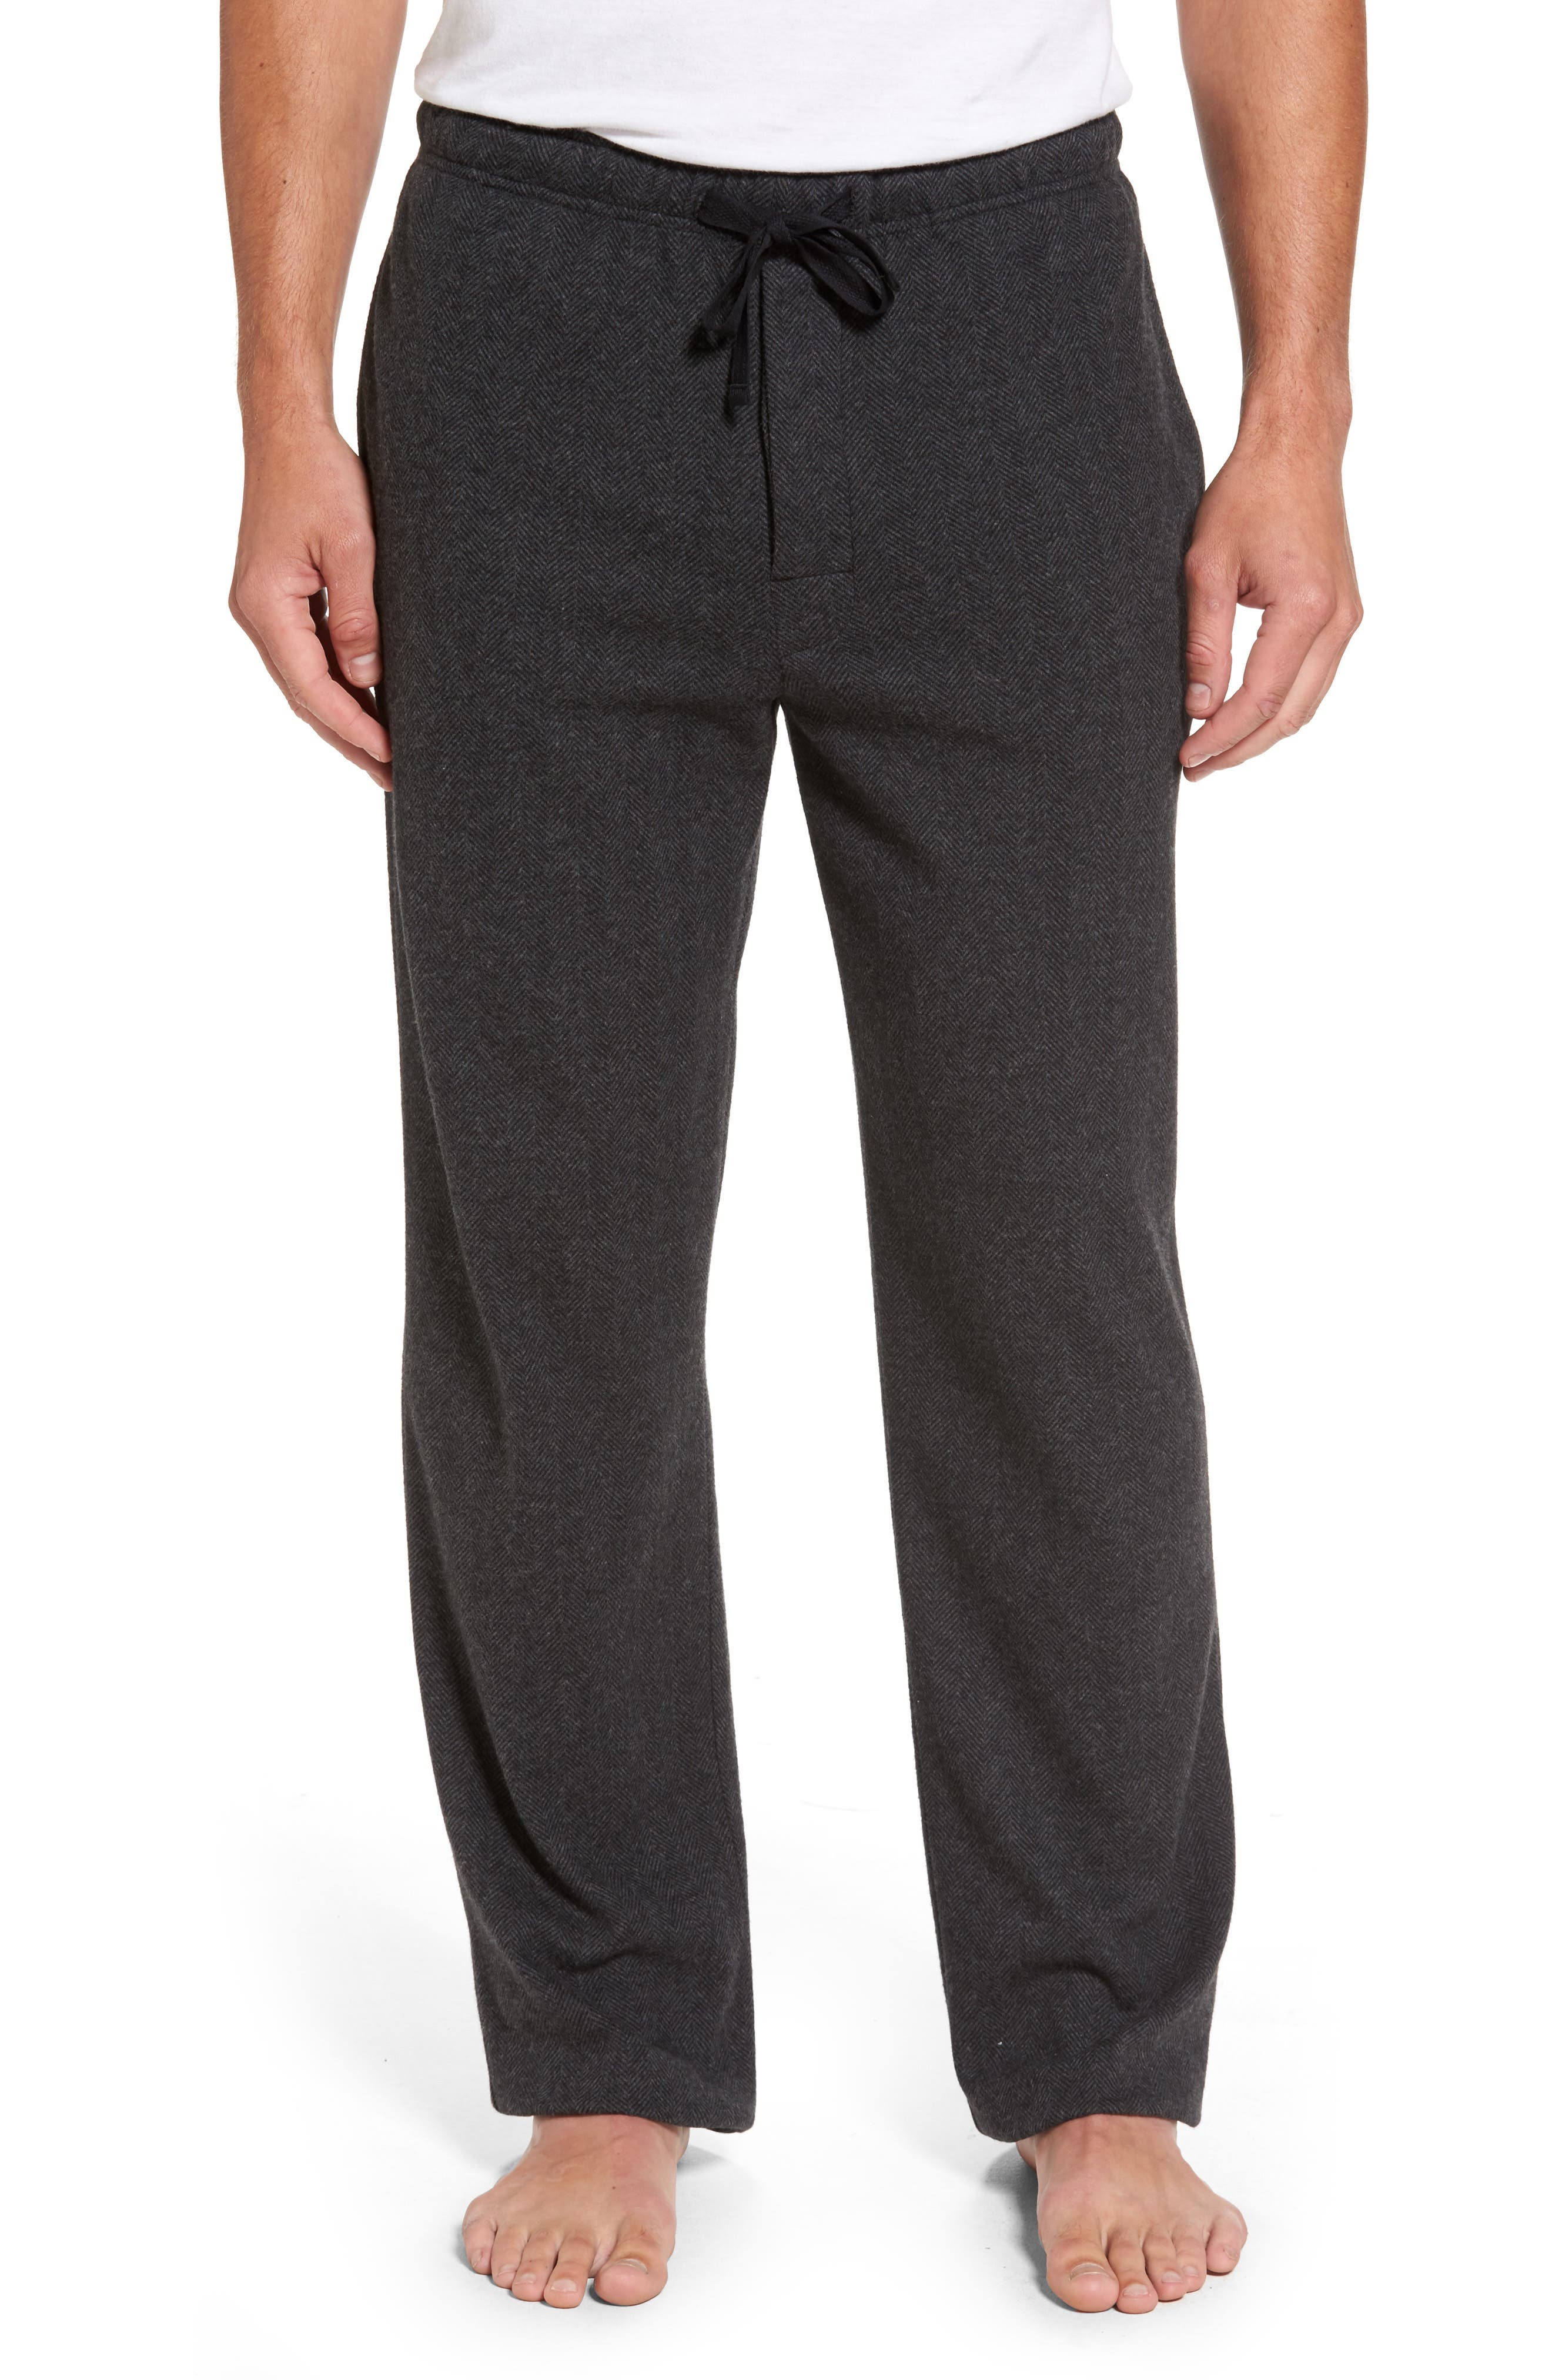 Grayson Lounge Pants,                             Main thumbnail 1, color,                             Charcoal